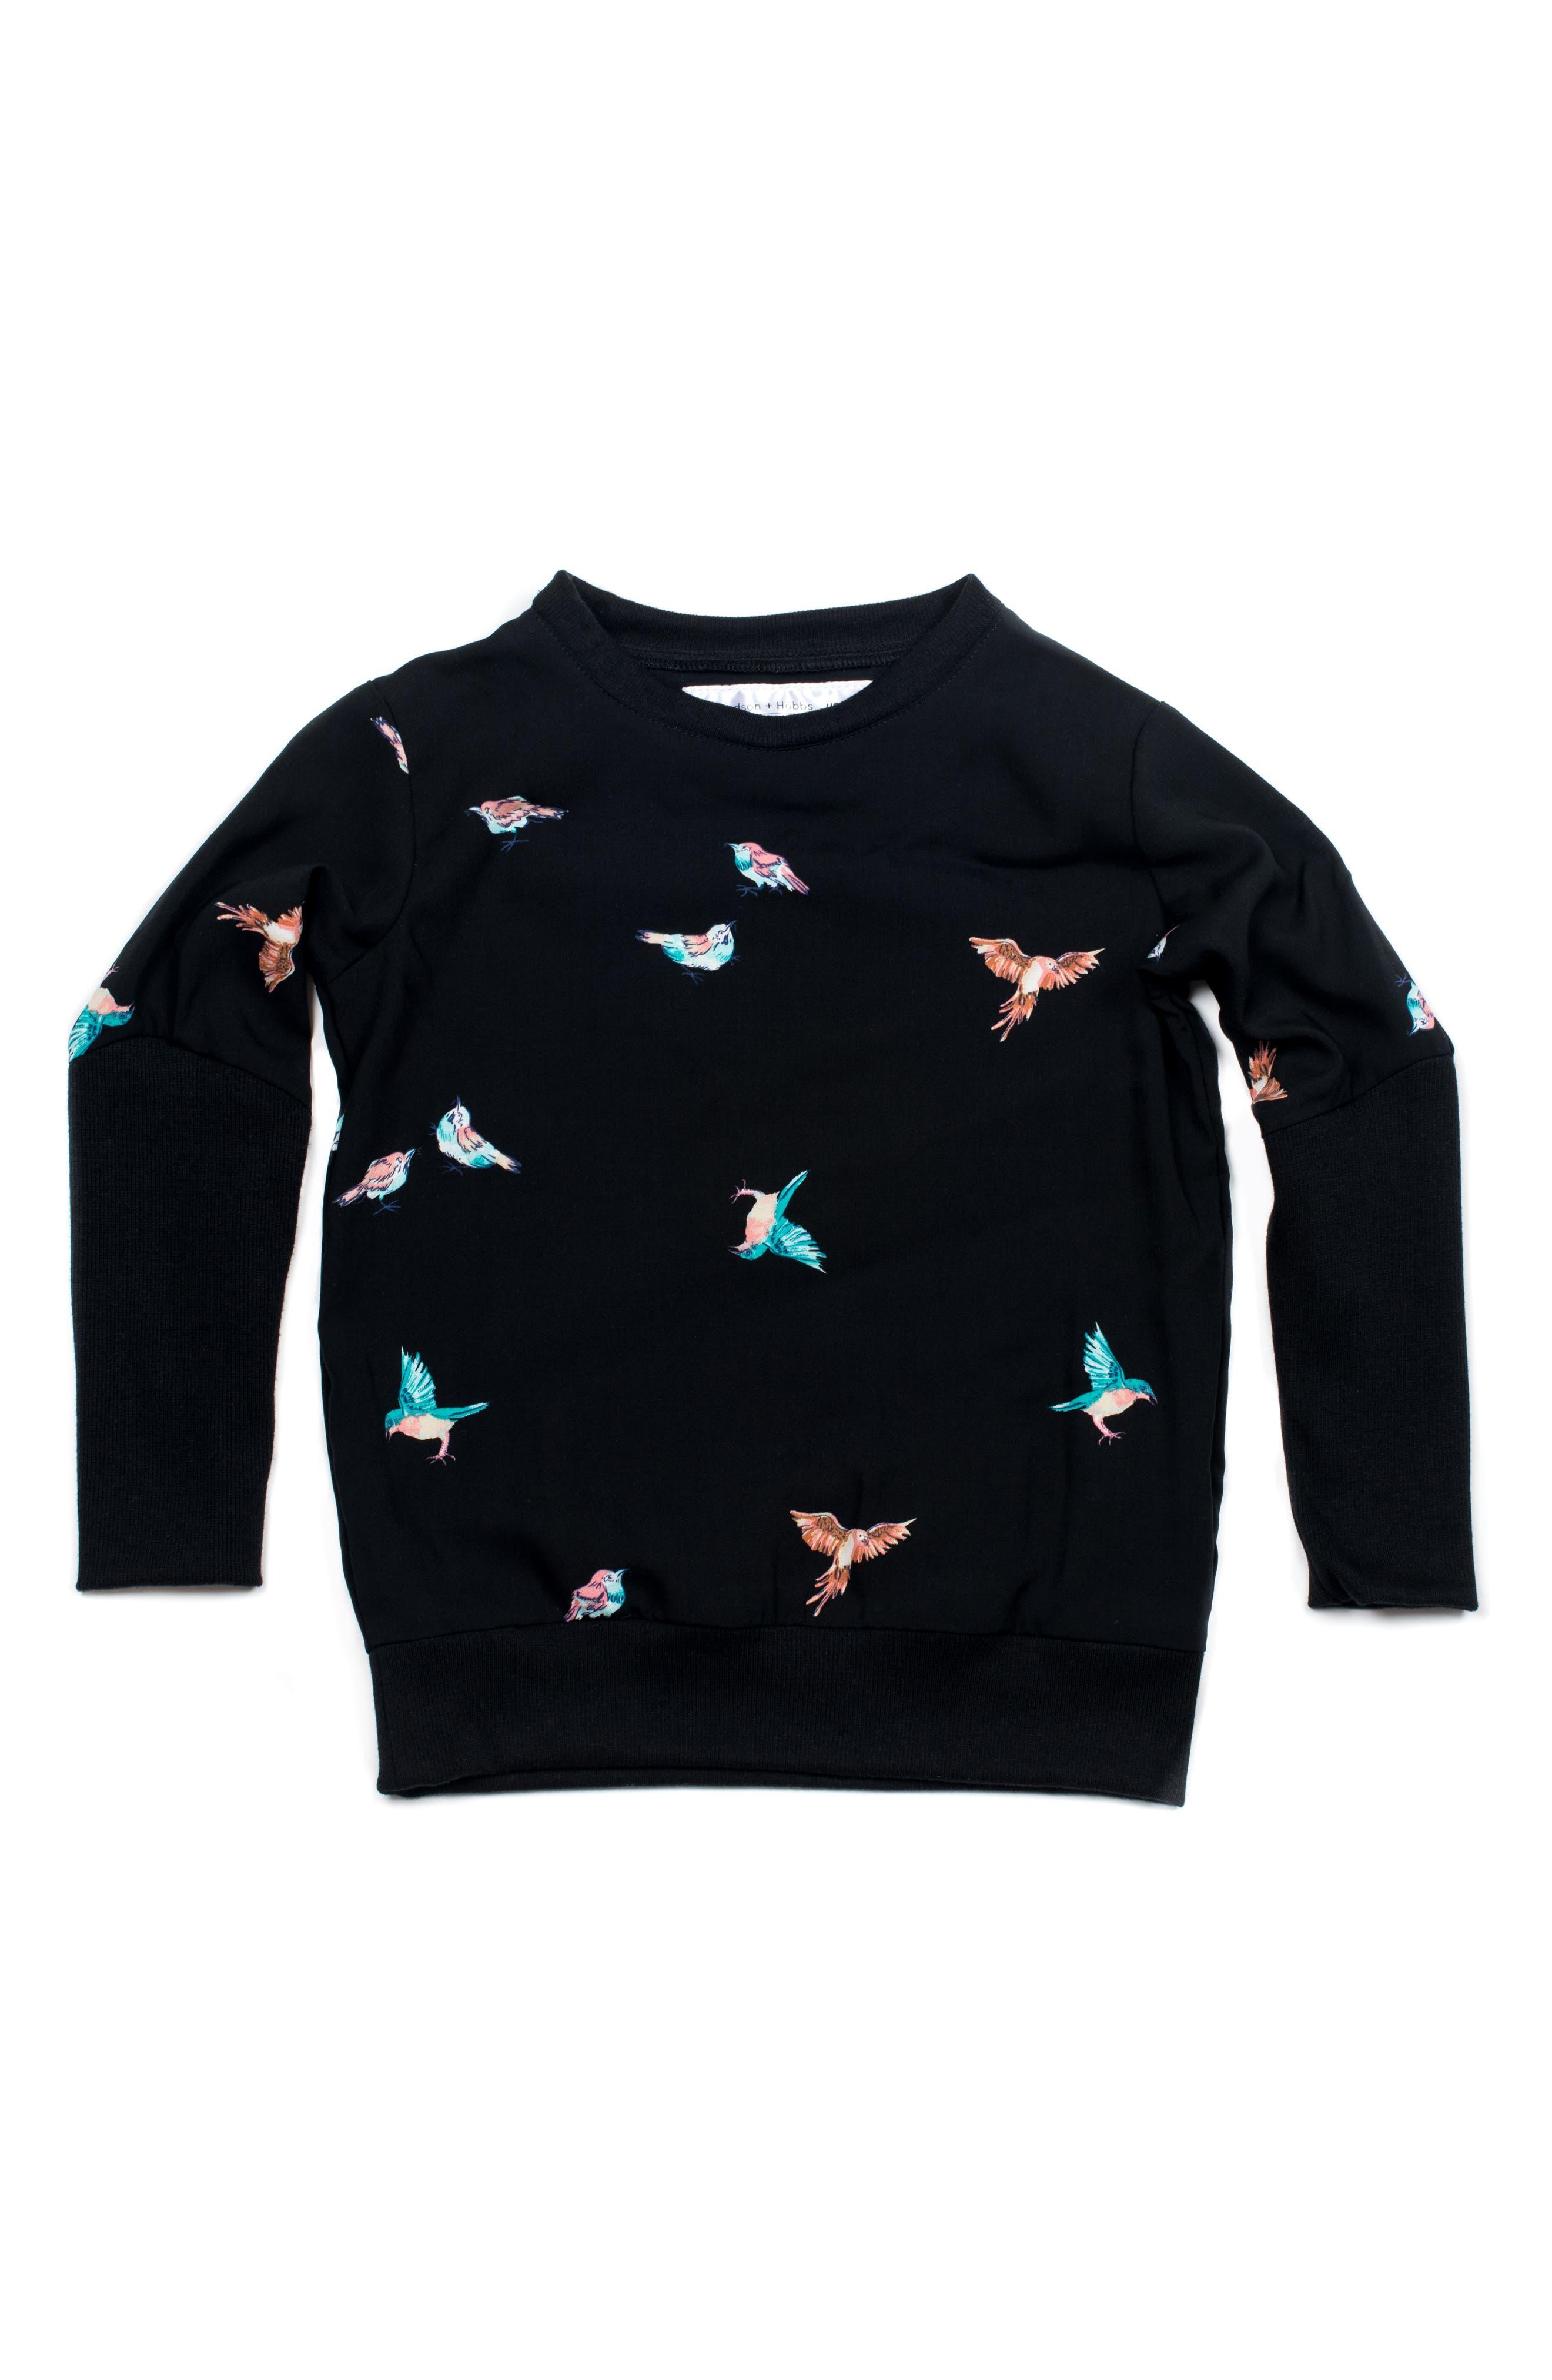 Summer Bird Woven Shirt,                             Main thumbnail 1, color,                             Black/ Multi